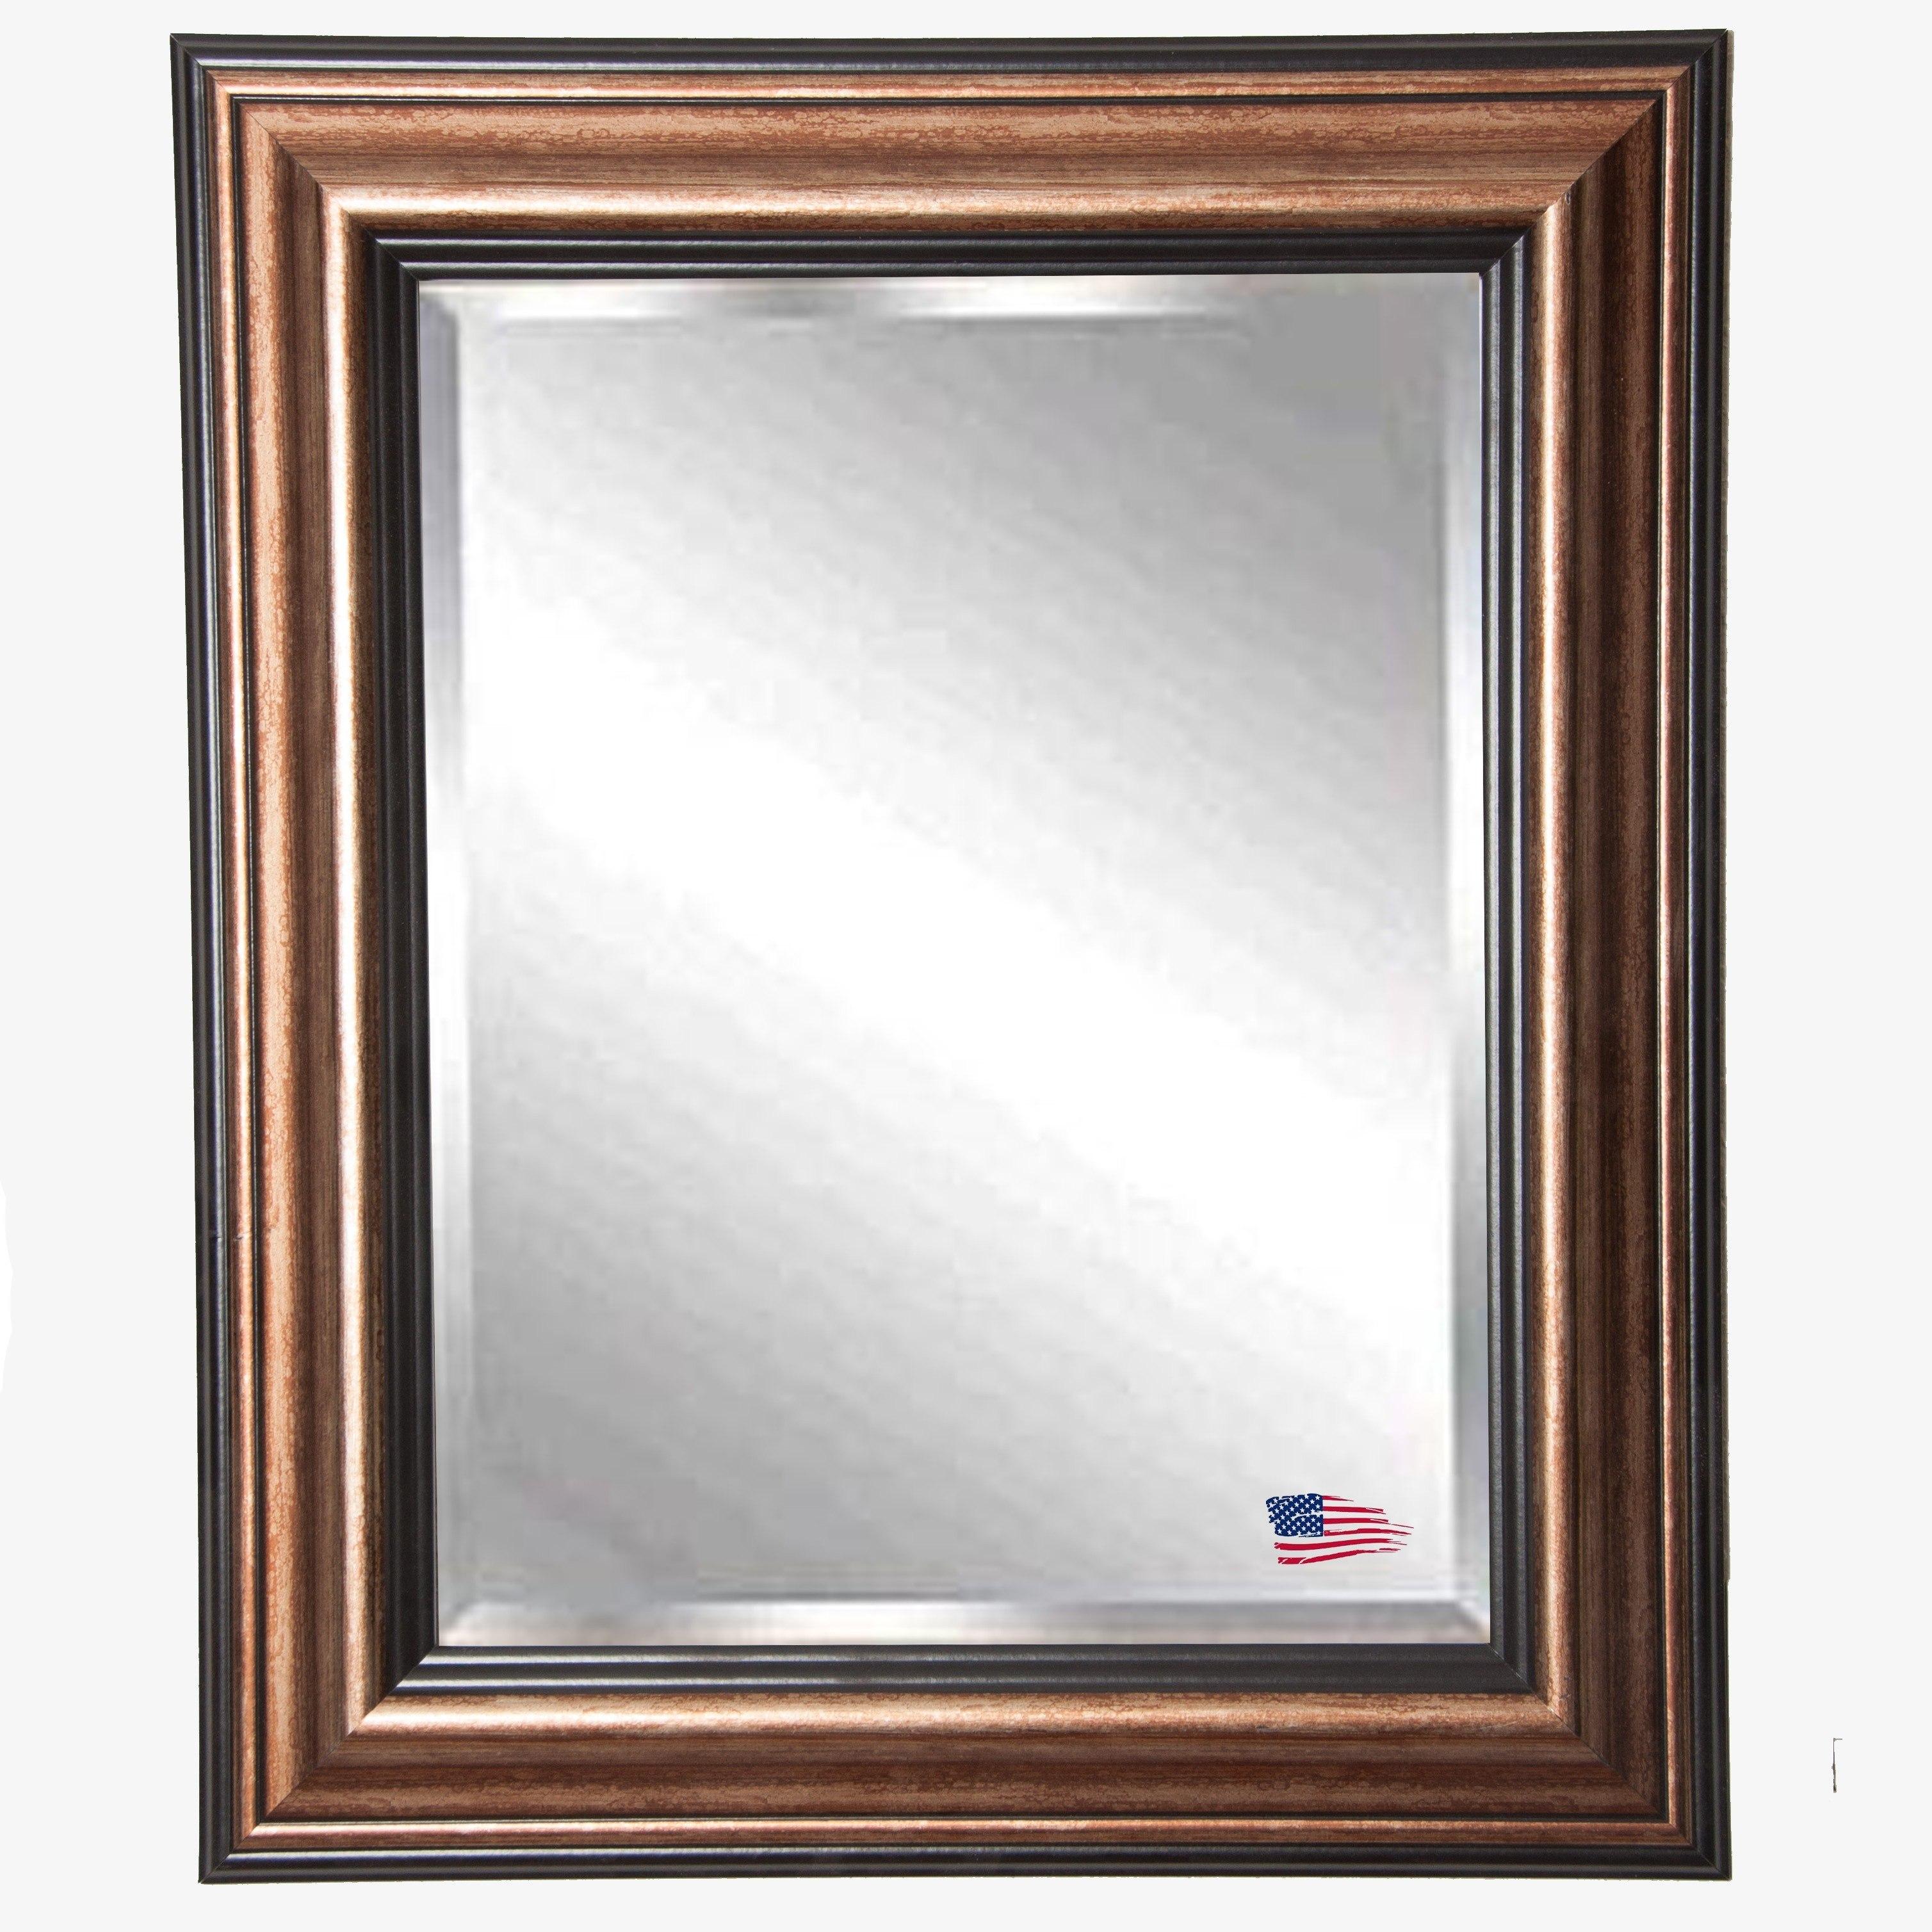 Rayne Mirrors R029MV 35.5 x 35.5 Inch Canyon Bronze Wall Mirror